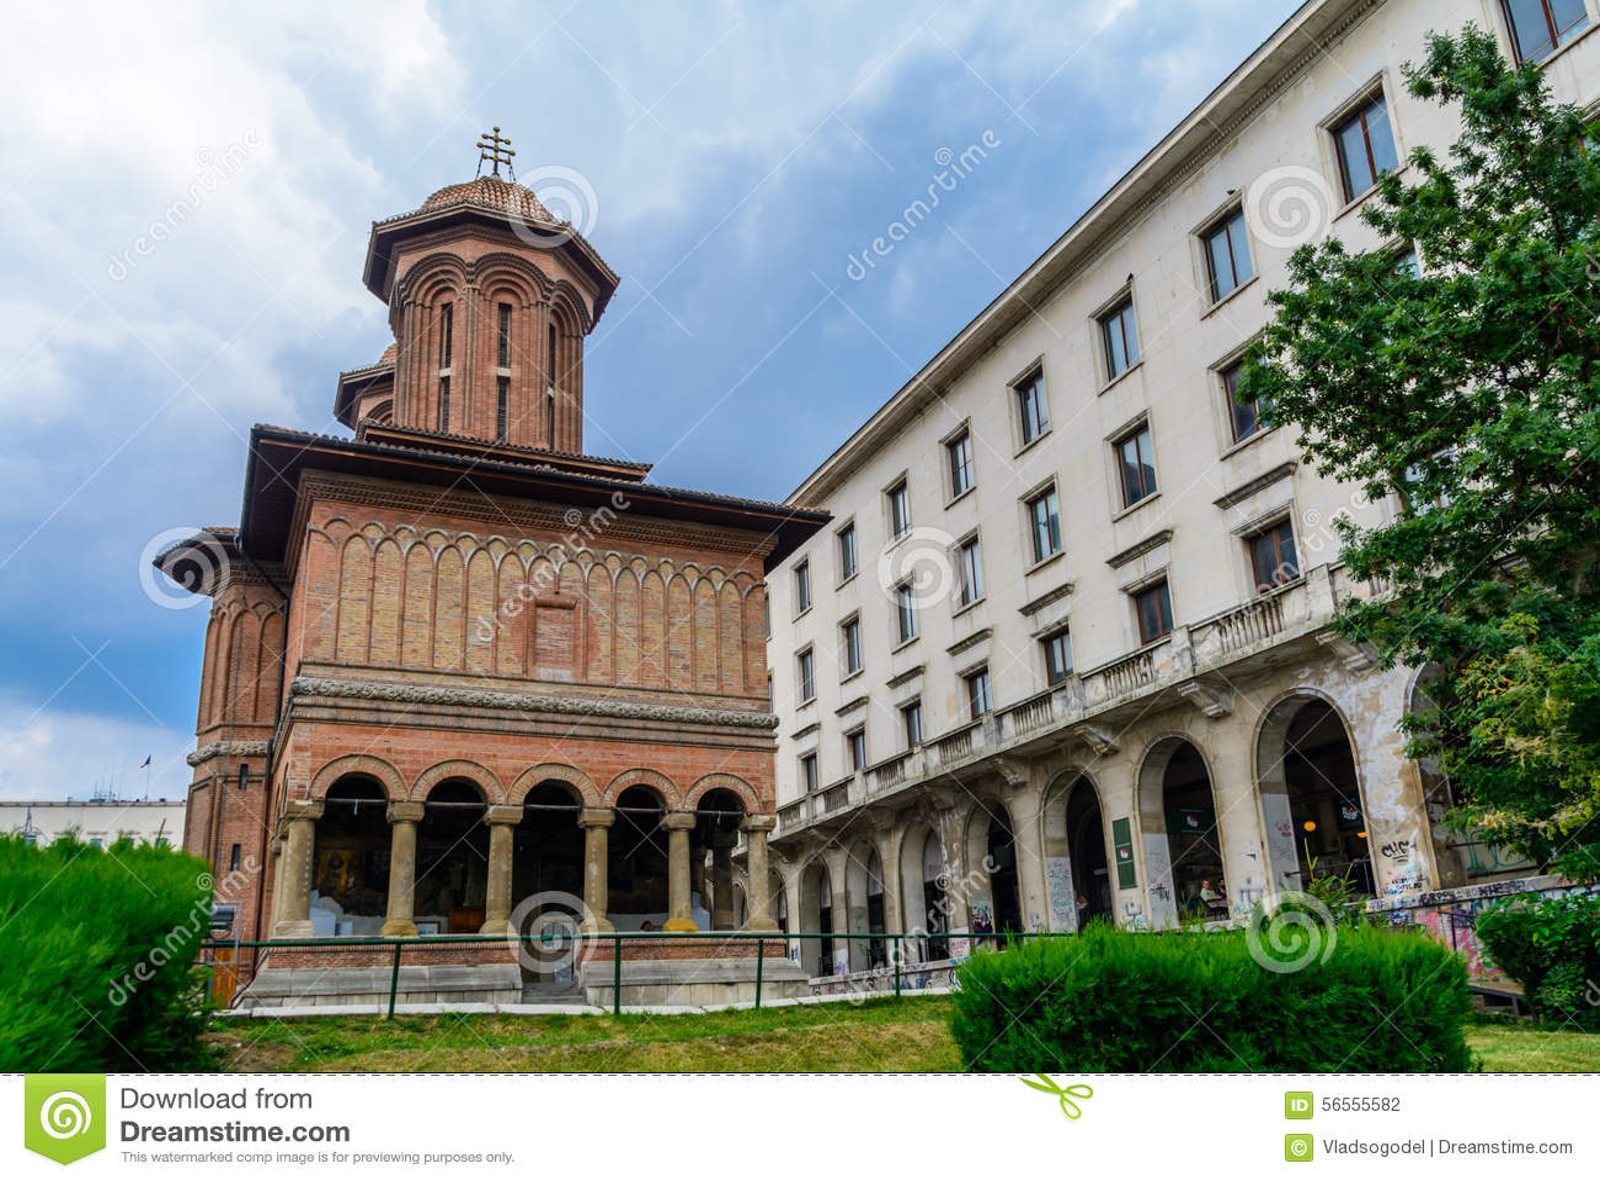 Download ΒΟΥΚΟΥΡΕΣΤΙ, ΡΟΥΜΑΝΙΑ - 28 ΙΟΥΝΊΟΥ: Εκκλησία Kretzulescu στις 28 Ιουνίου 2015 στο Βουκουρέστι, Ρουμανία Η εκκλησία χτίστηκε το 17 Στοκ Εικόνες - εικόνα από αγγλικά, χρώμα: 56555582